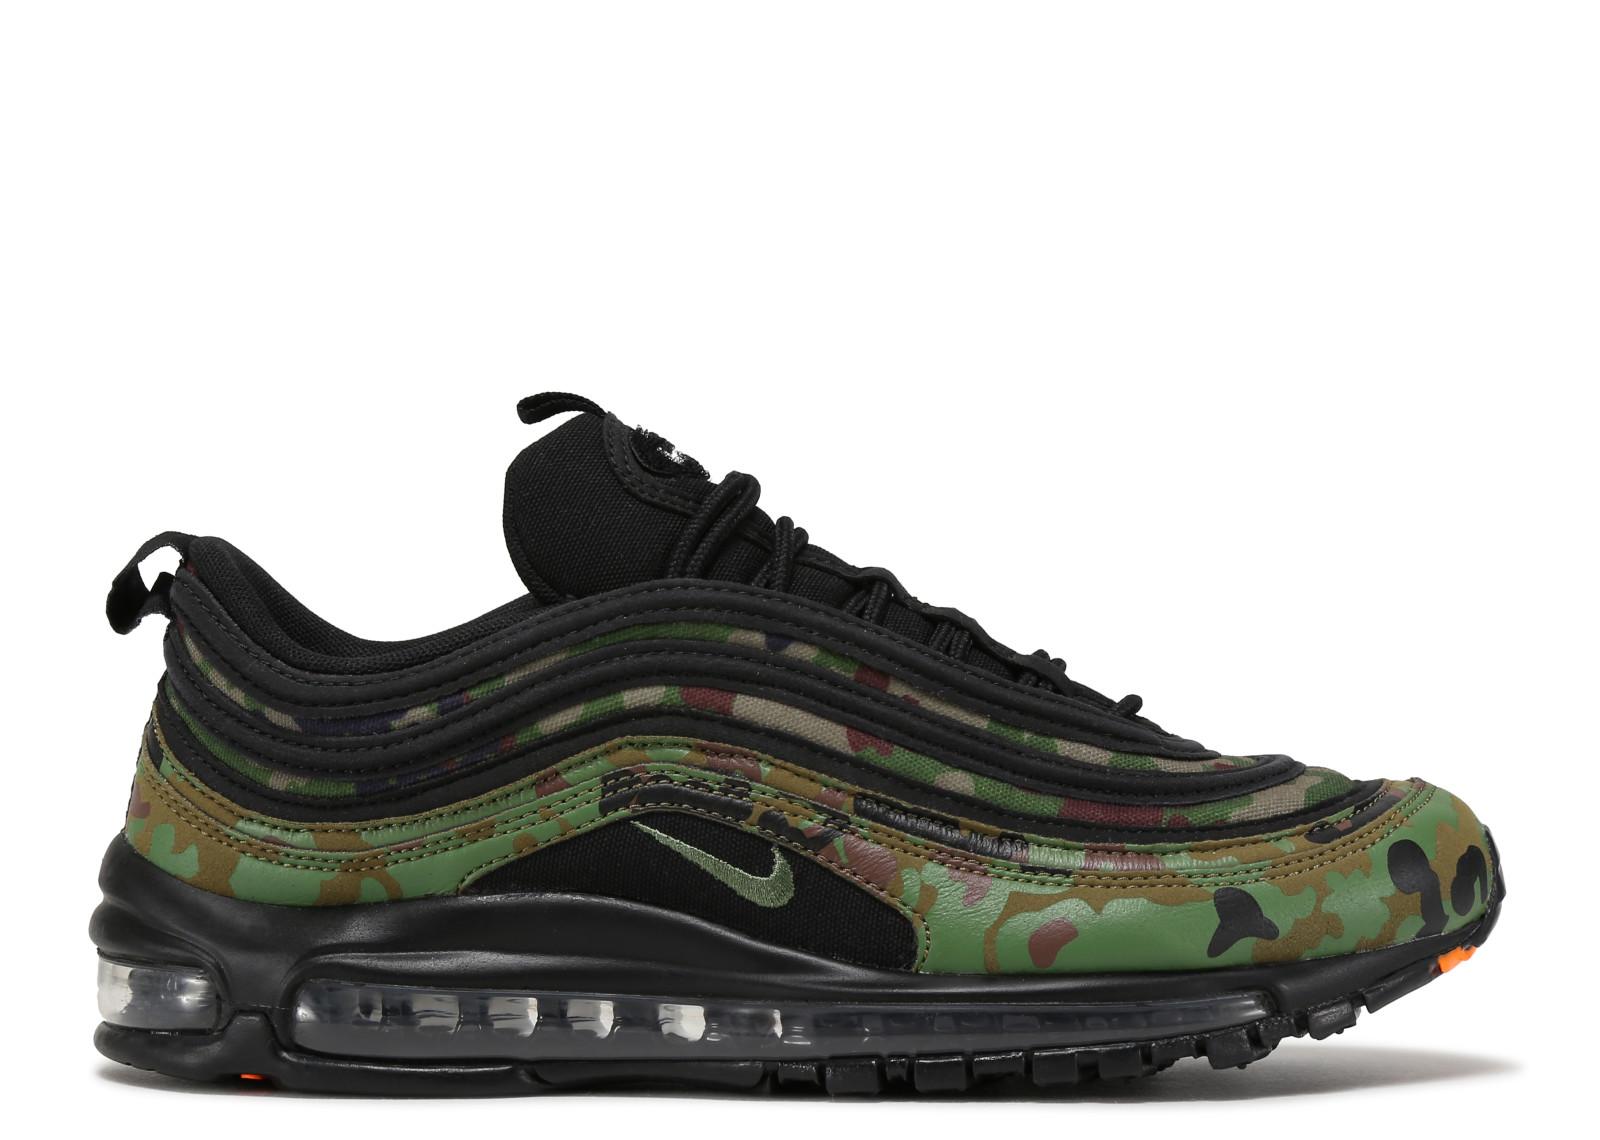 Comfortable Nike Air Max 97 Premium QS Country Camo Pack Medium Olive Black Dark Army AJ2614 200 Men's Footwear Running Shoe